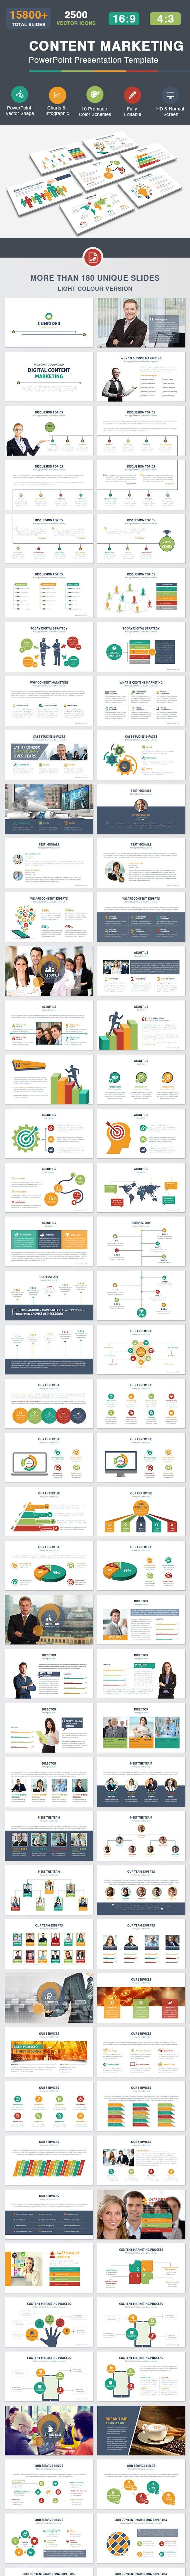 content marketing powerpoint presentation template by dotnpix